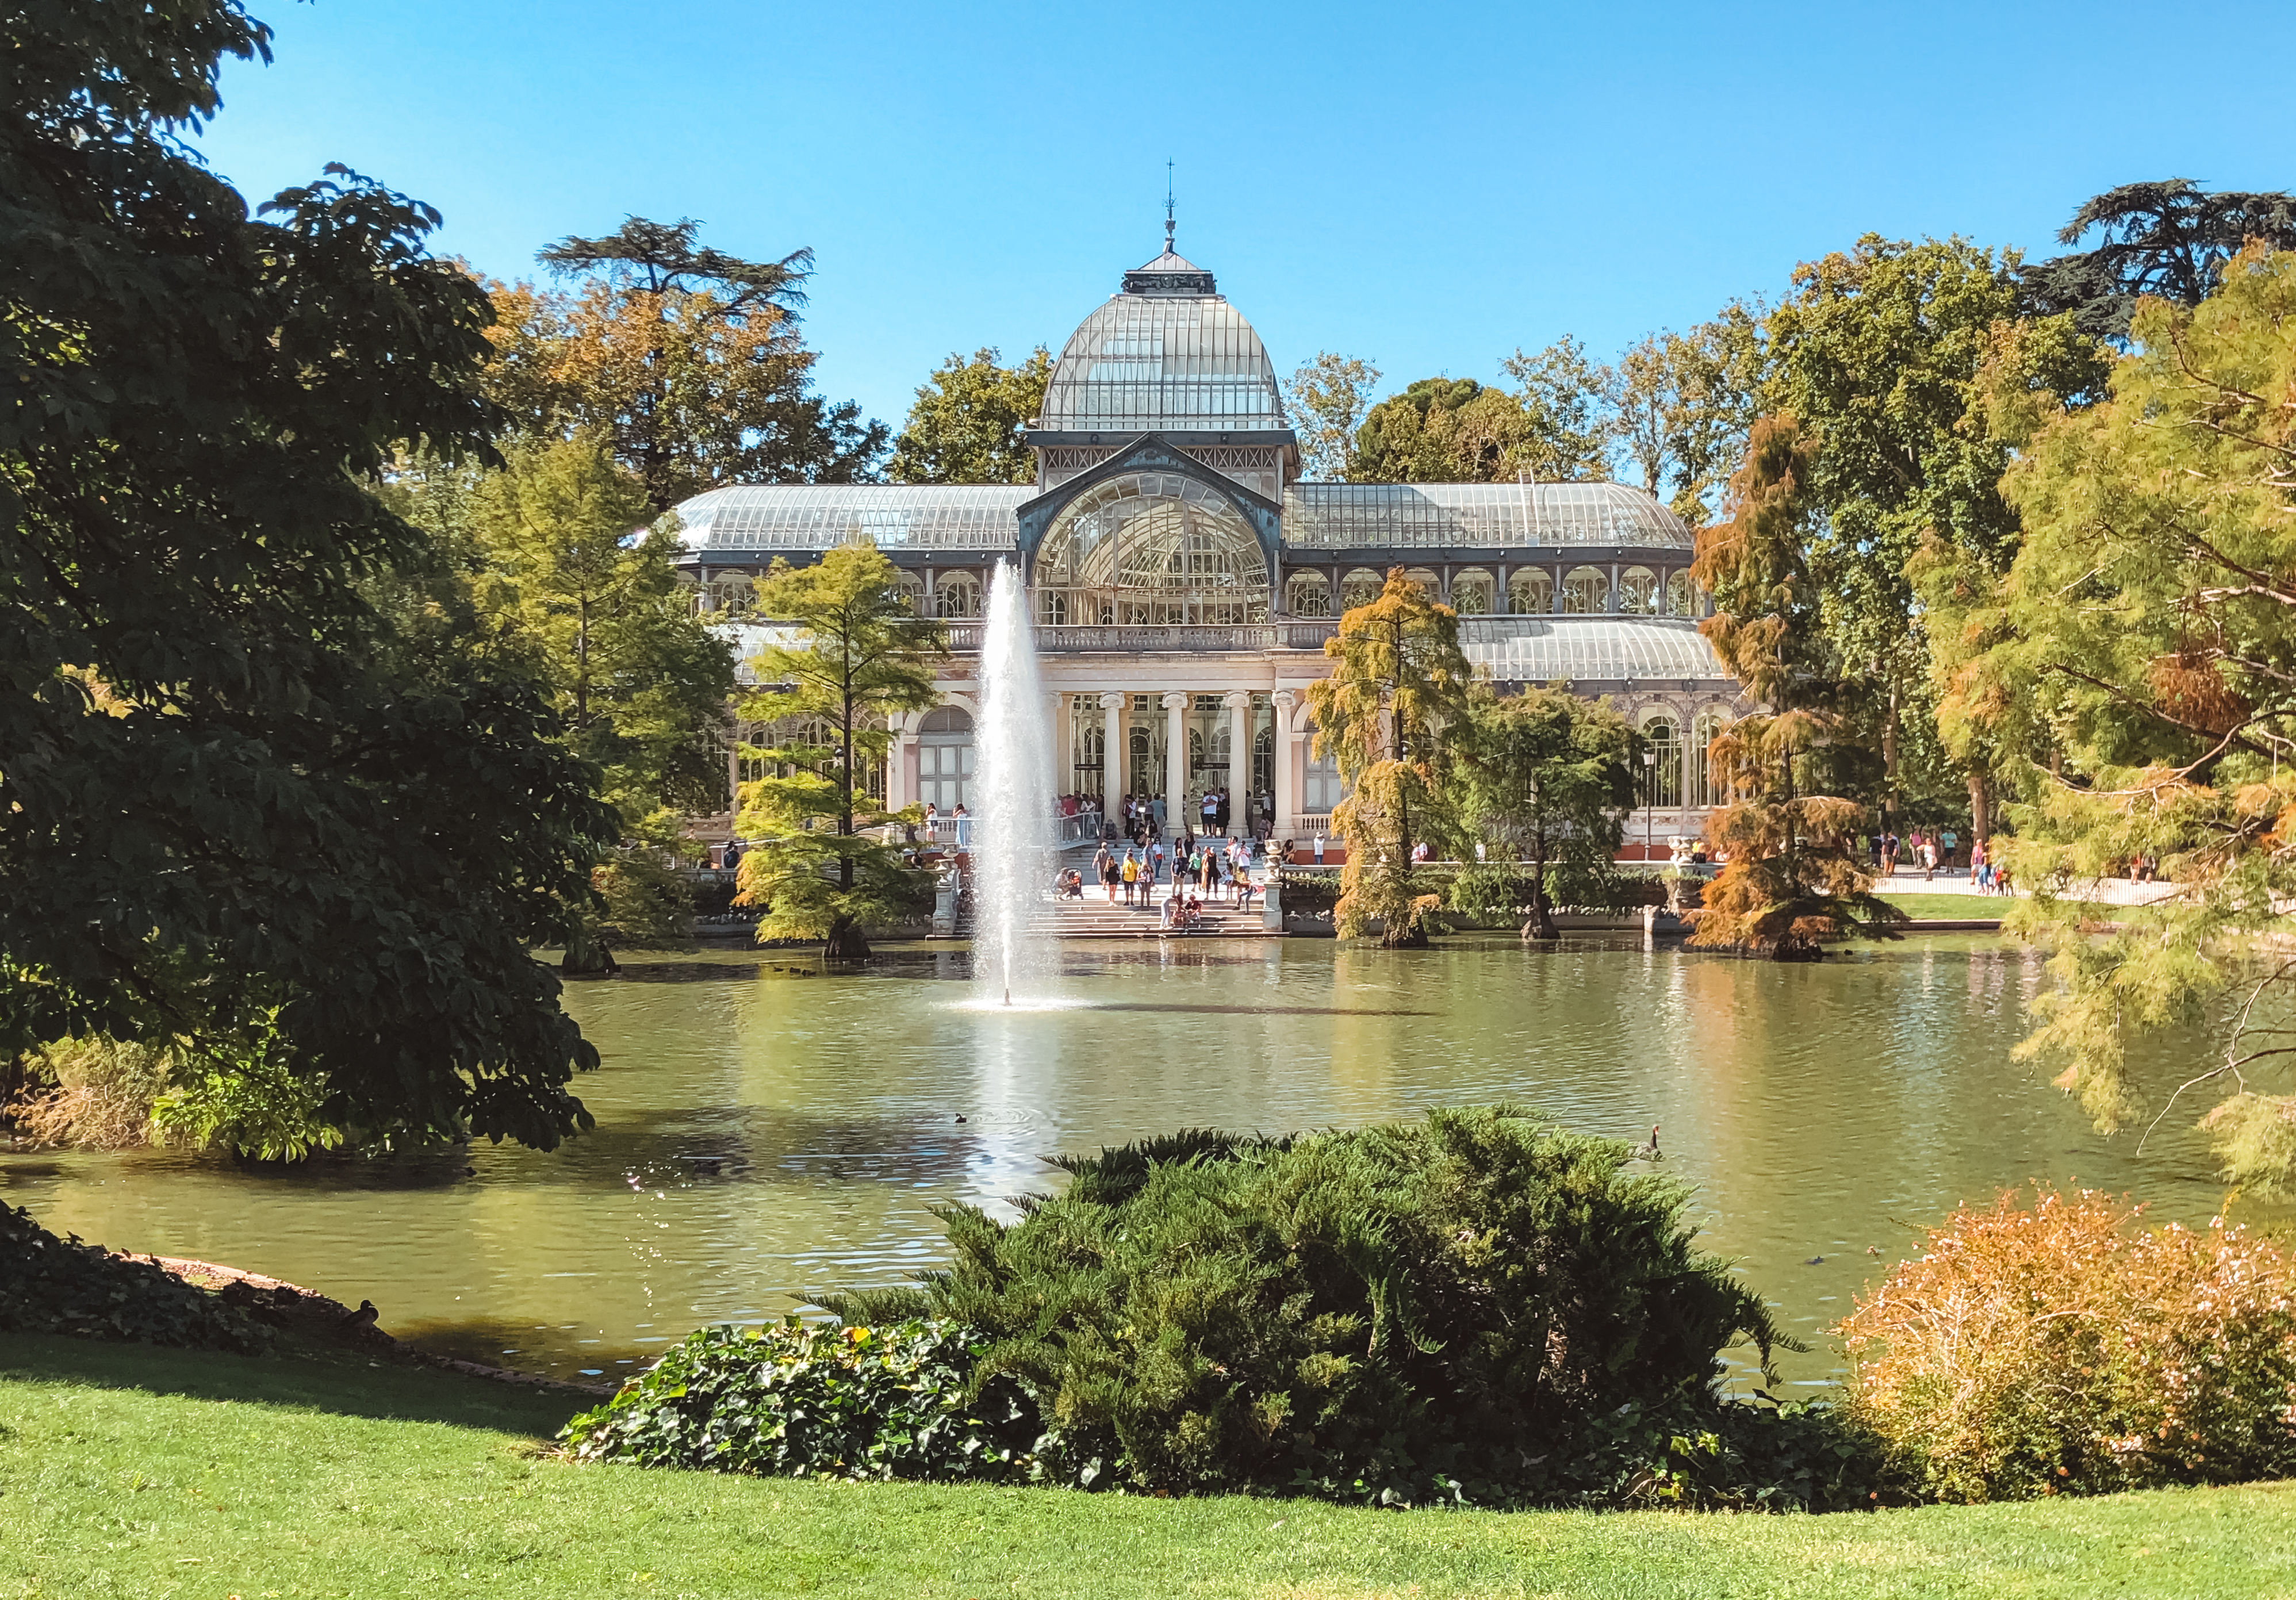 muslim-travel-guide-Madrid-Spain-El-Retiro-park-crystal-palace